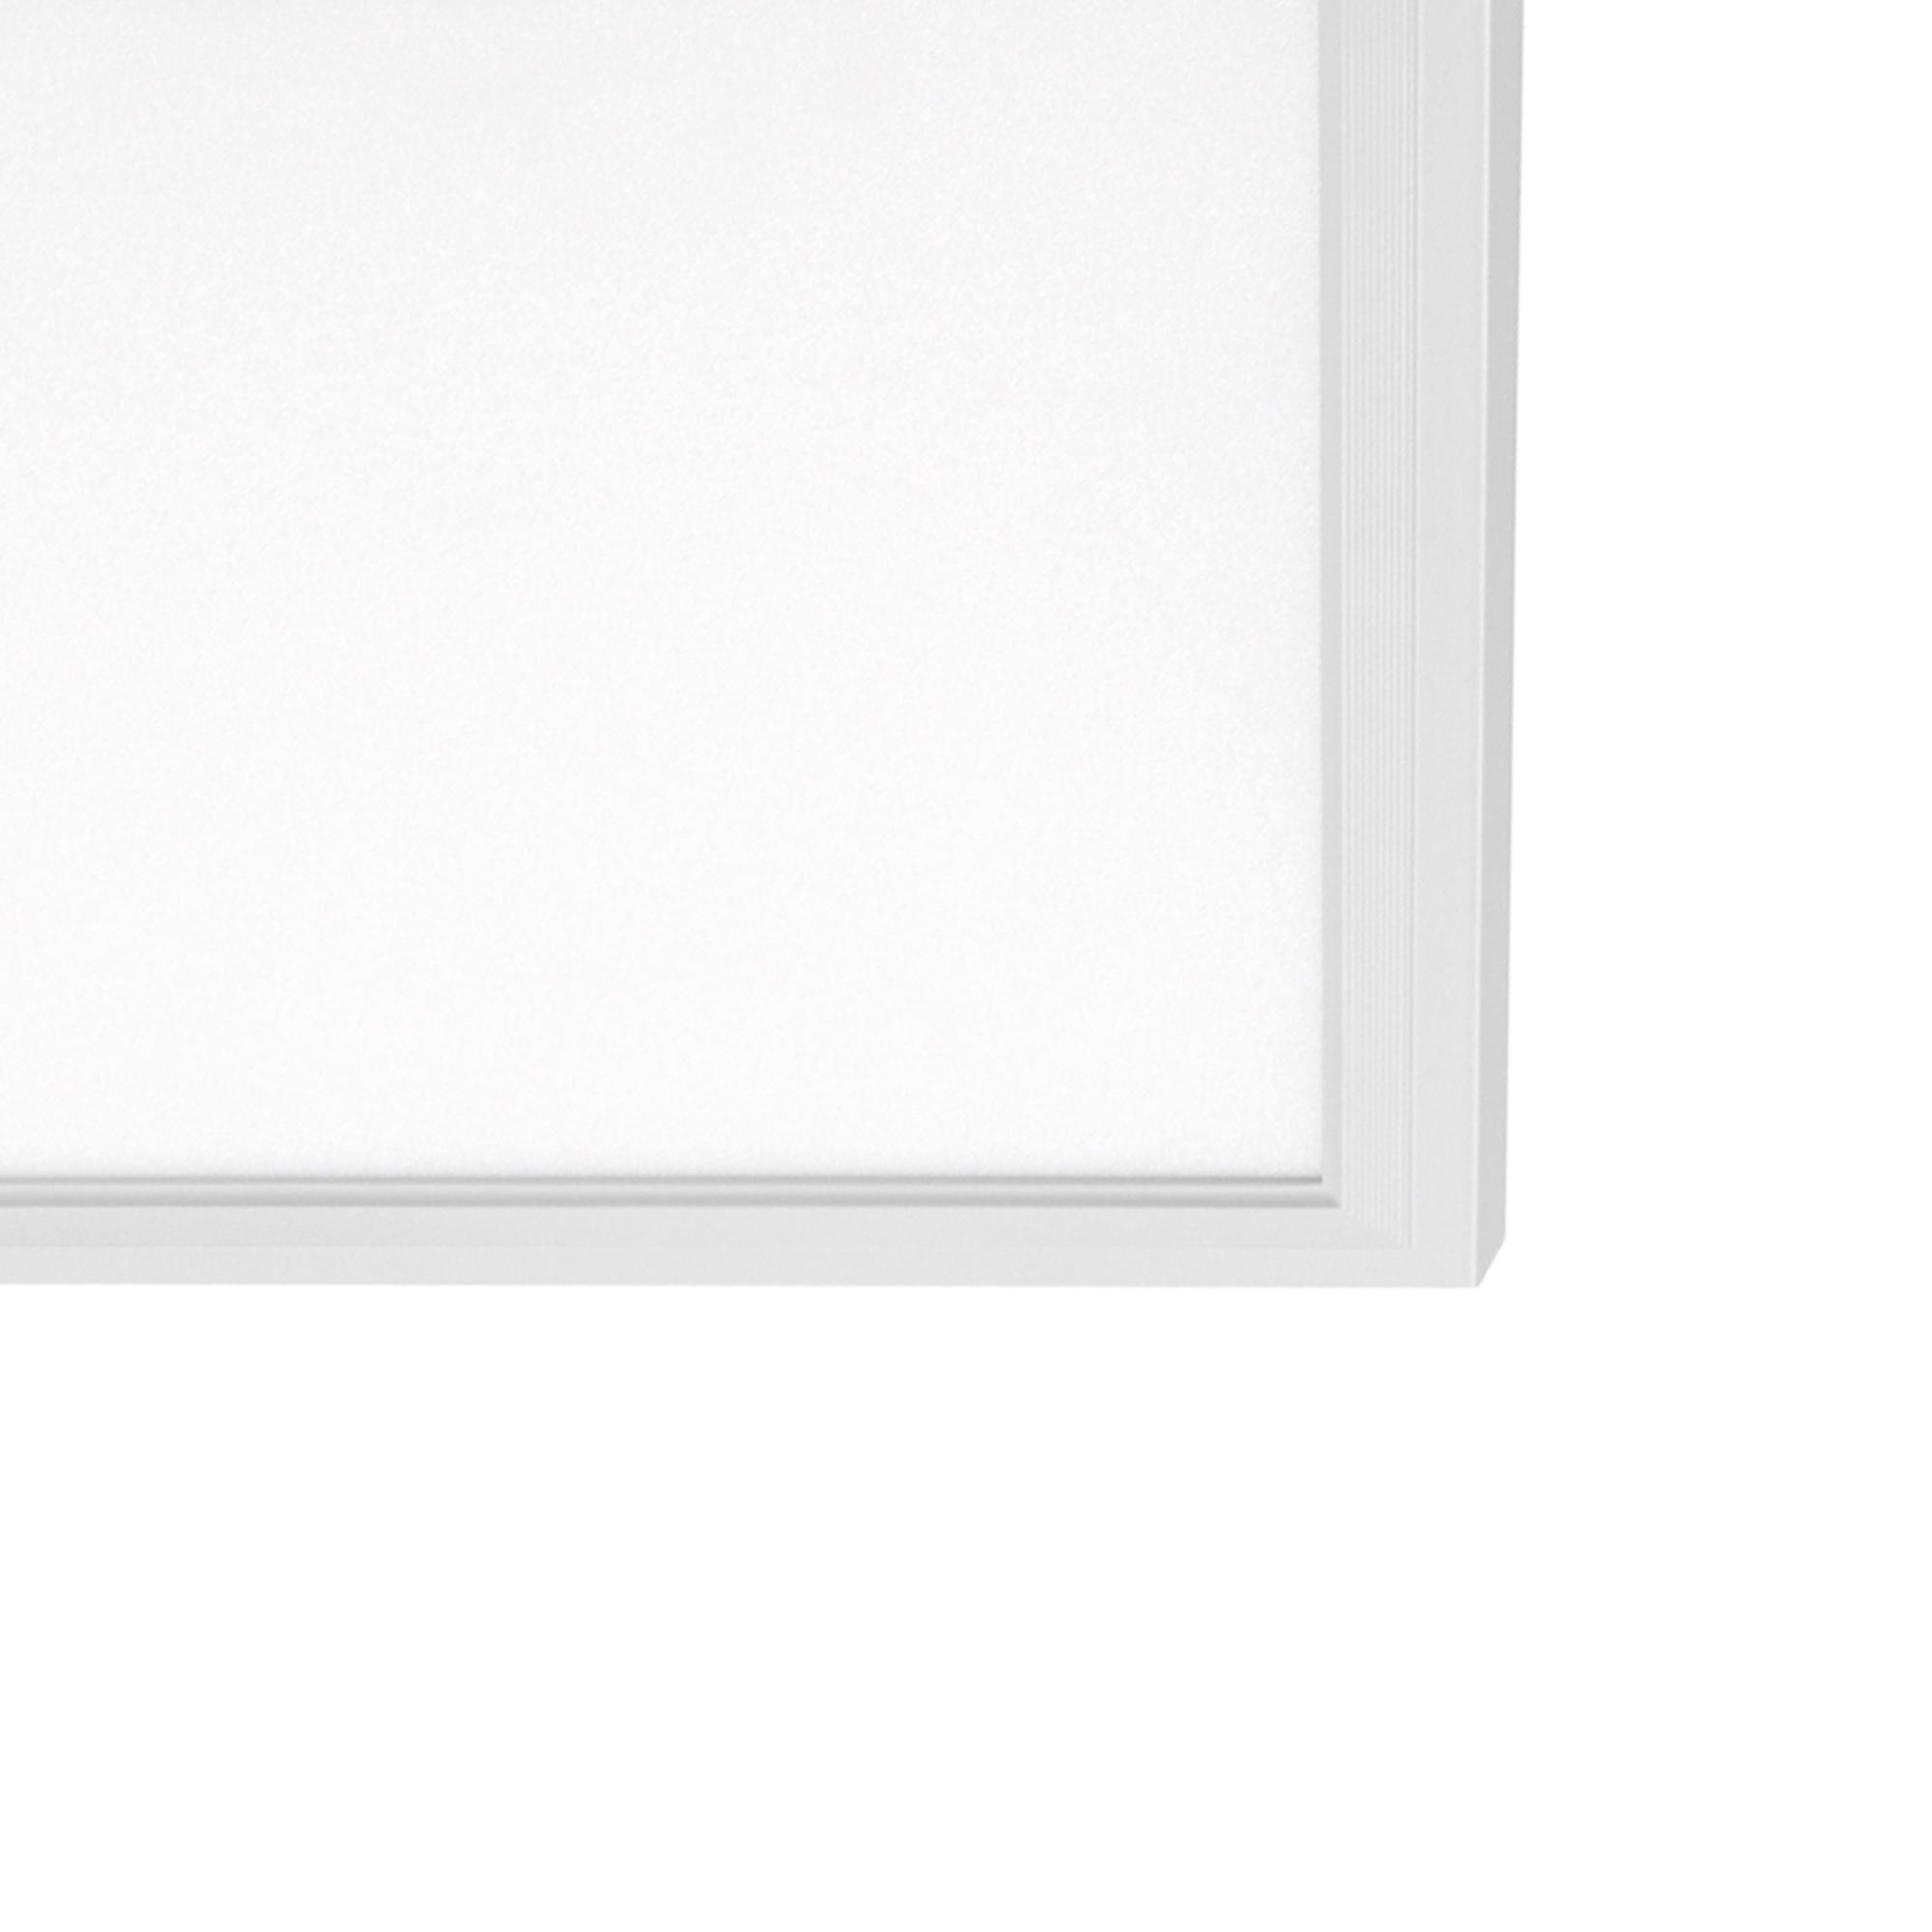 LED Panel, 119,5 cm, 4100 LUMEN, 38 WATT, Weiß